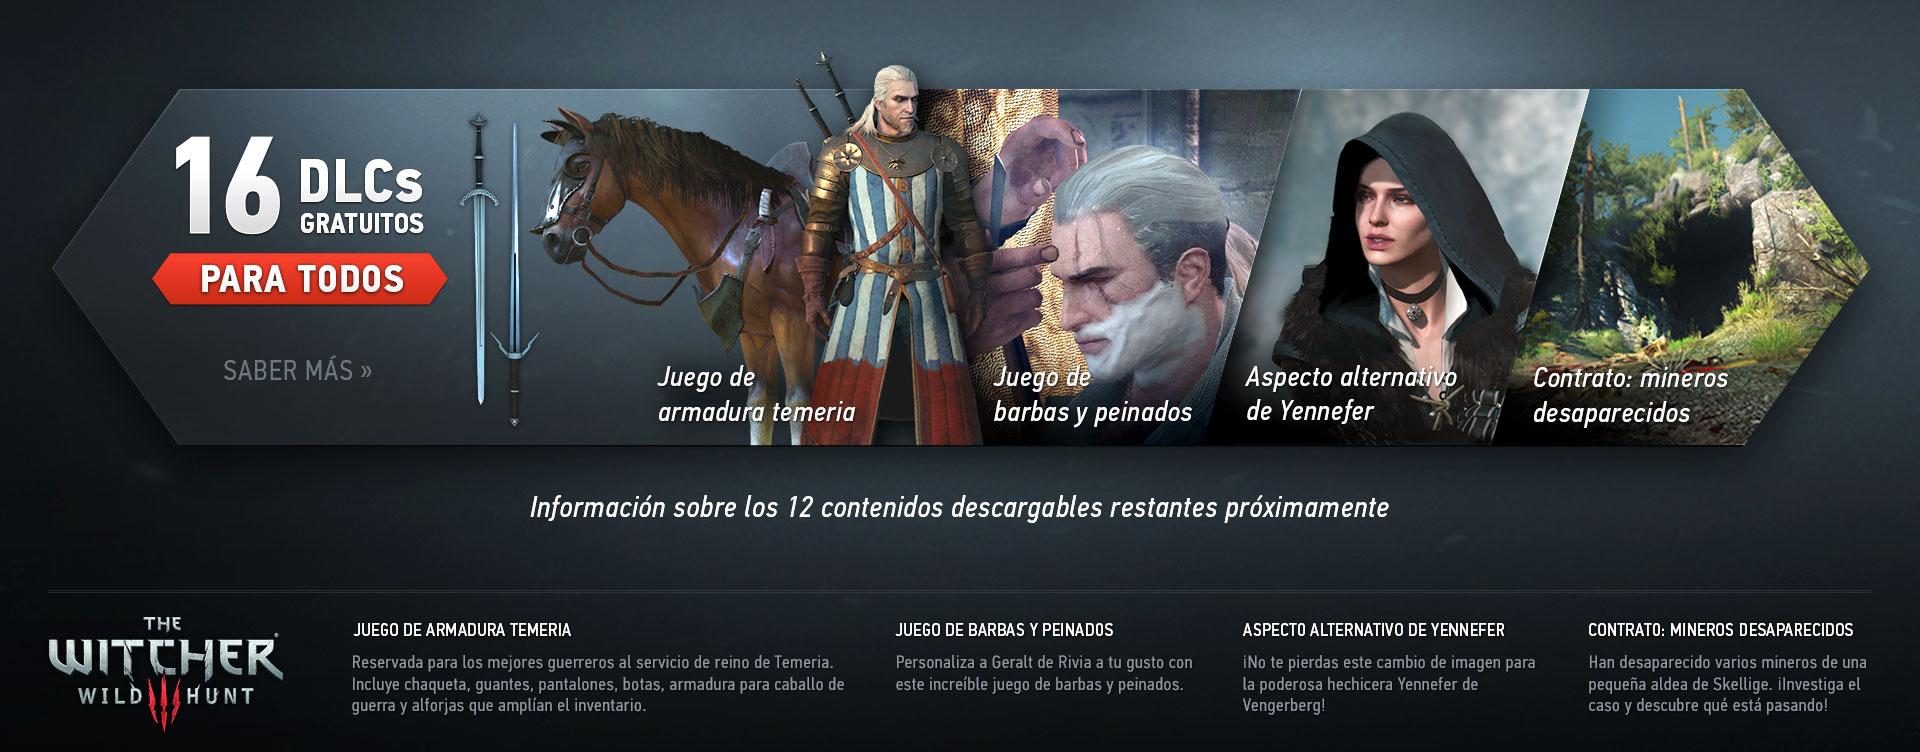 The Witcher 3 regalará 16 DLC